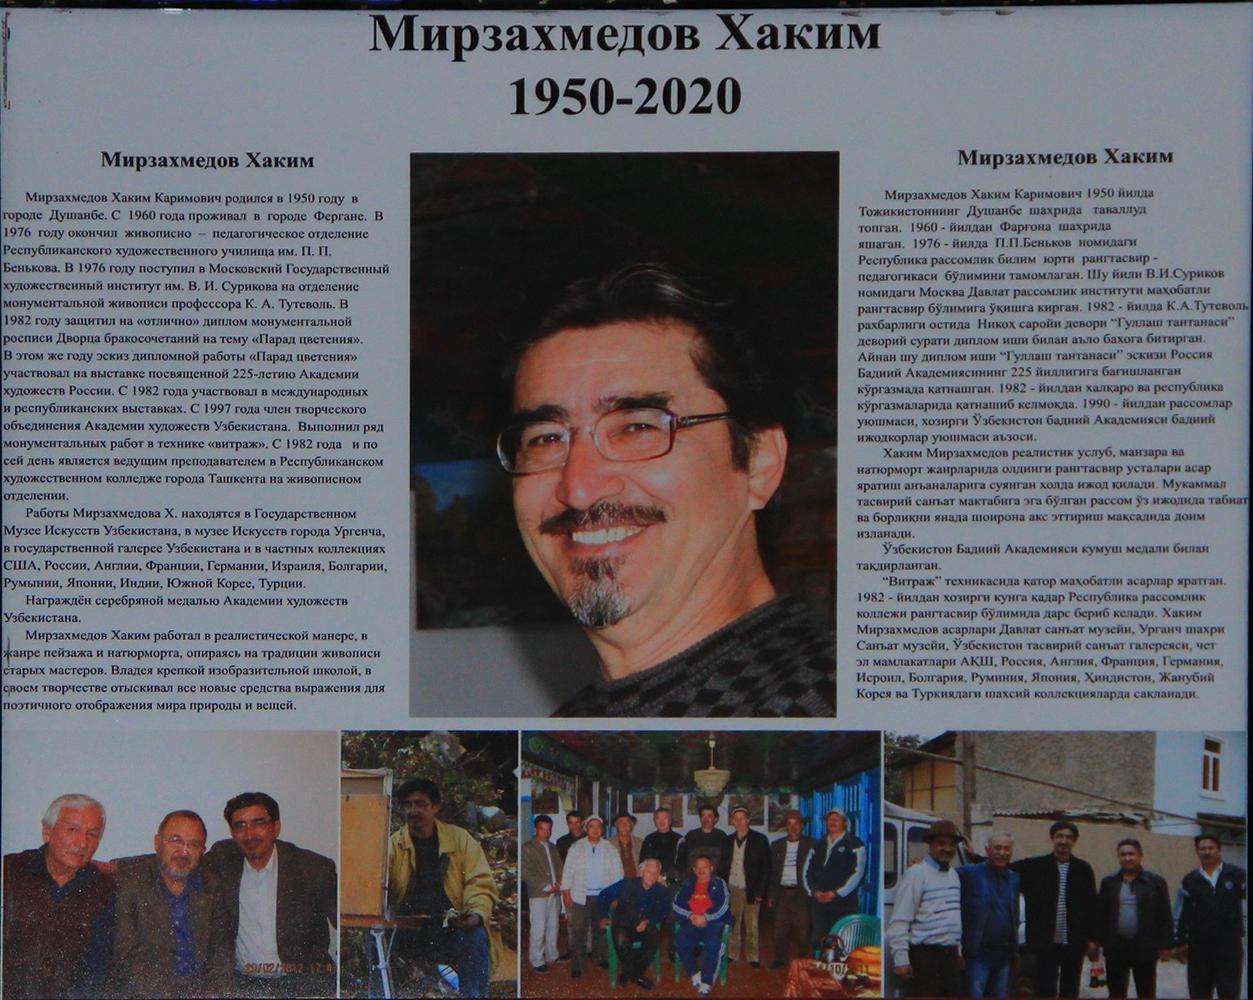 Мирзаахмедов Хаким